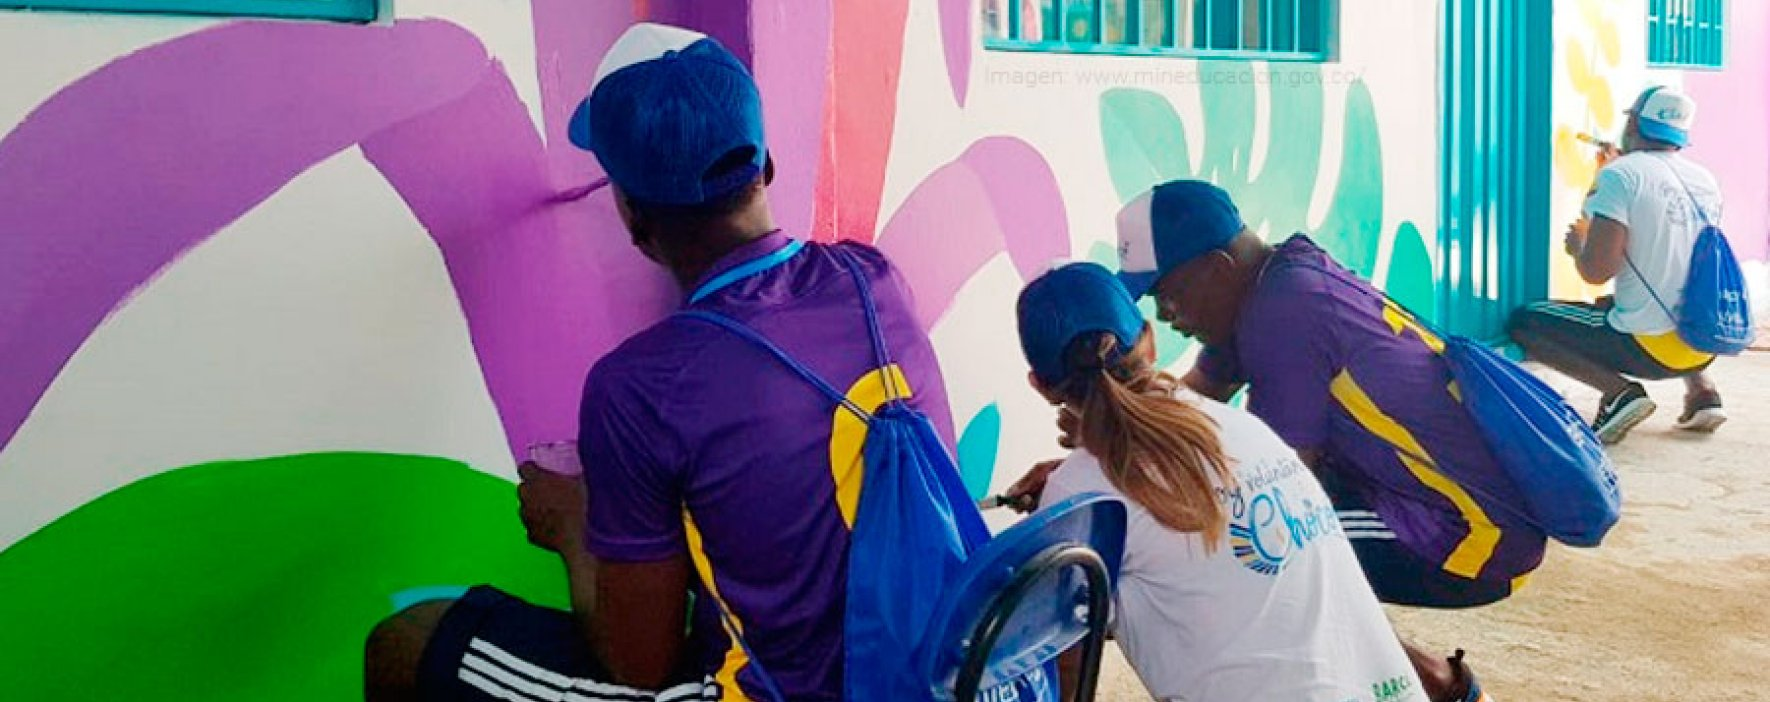 Icetex abre convocatoria para bachilleres destacados del Cauca